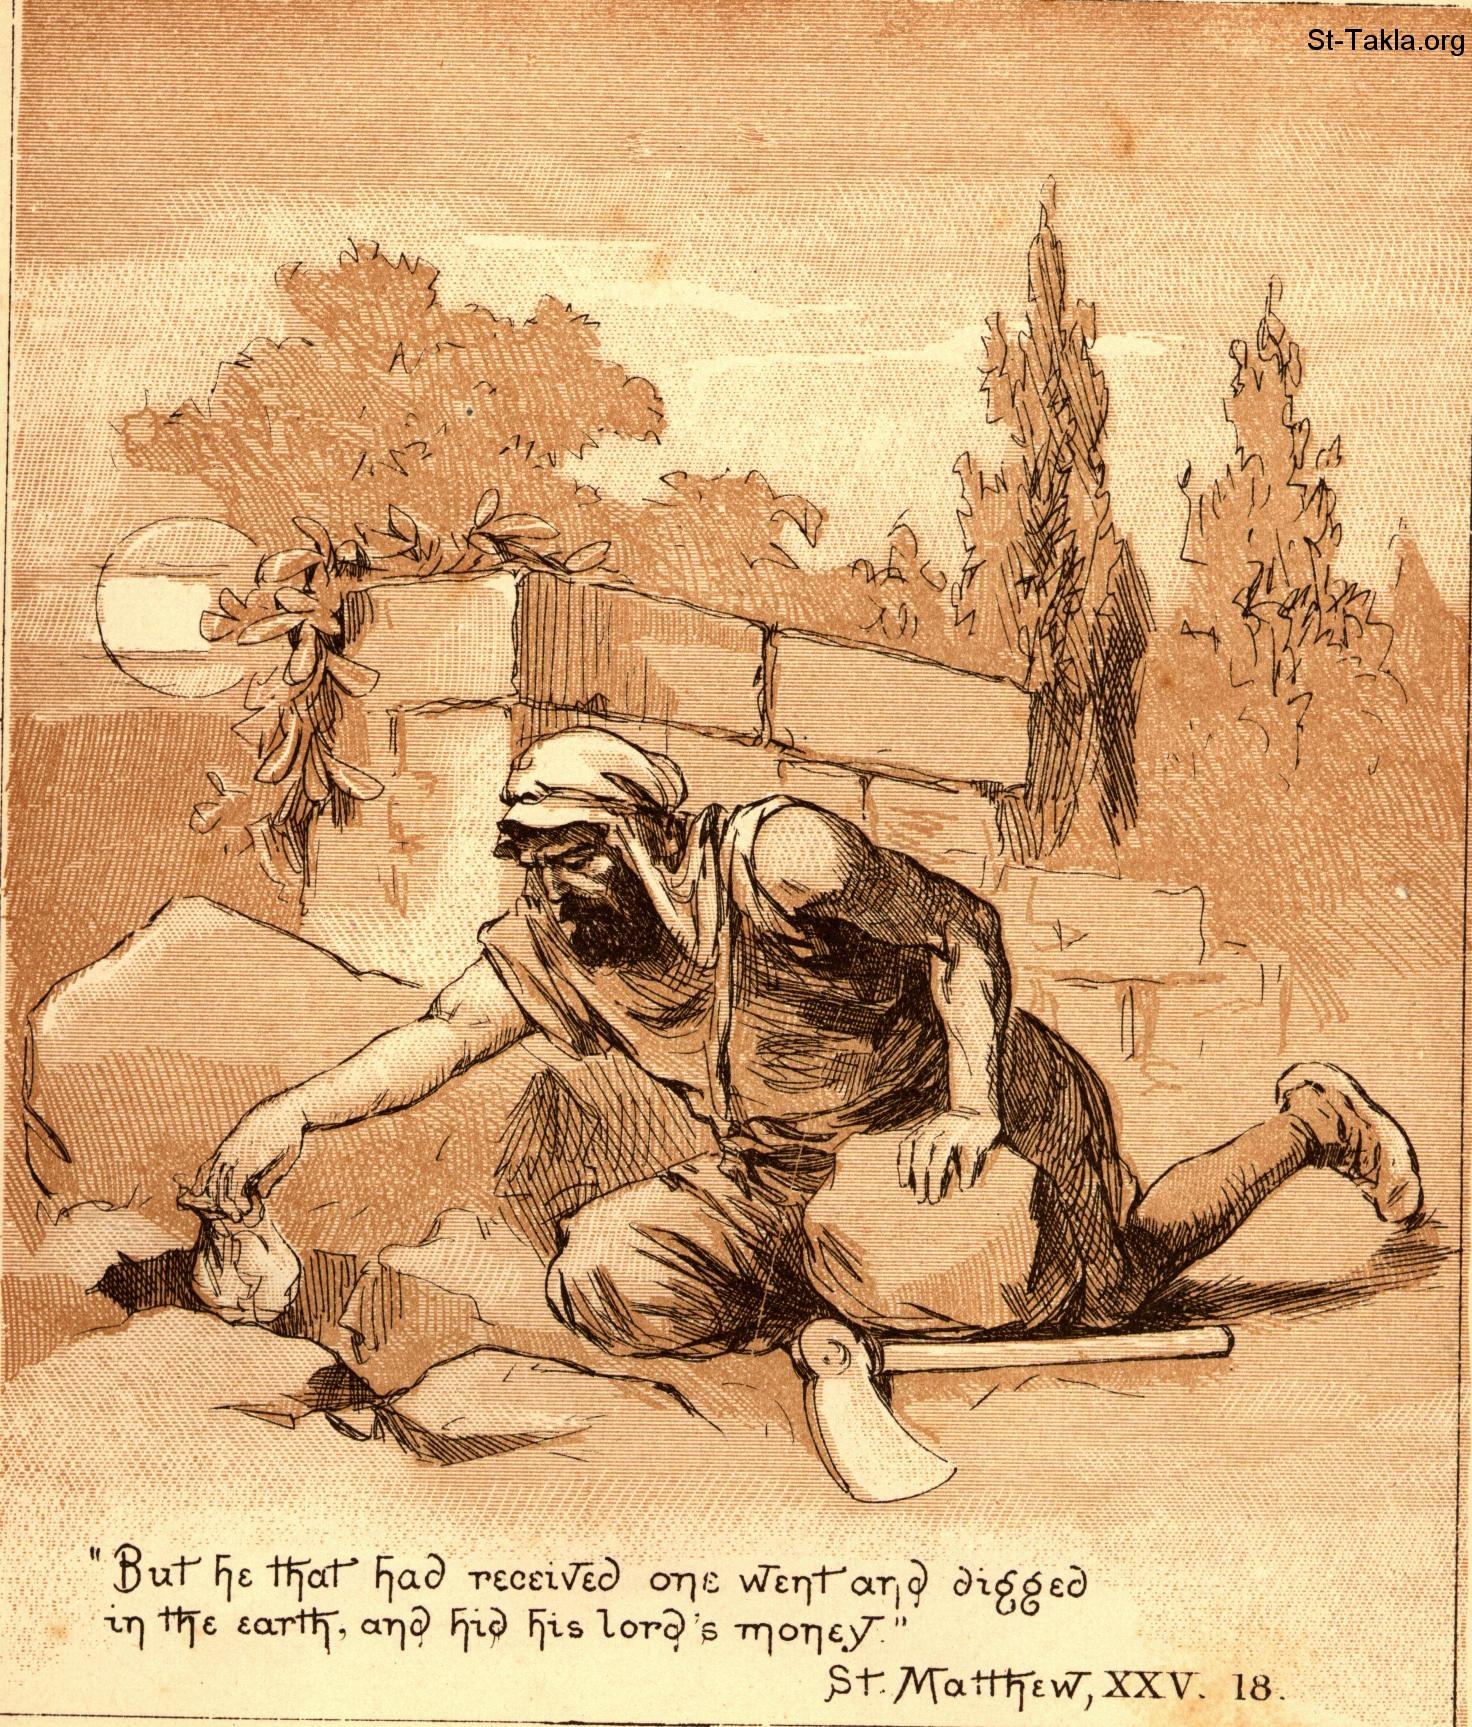 http://st-takla.org/Gallery/var/albums/Bible/Illustrations/Coloured-Picture-Bible/www-St-Takla-org--foolish-servant.jpg?m=1312679898